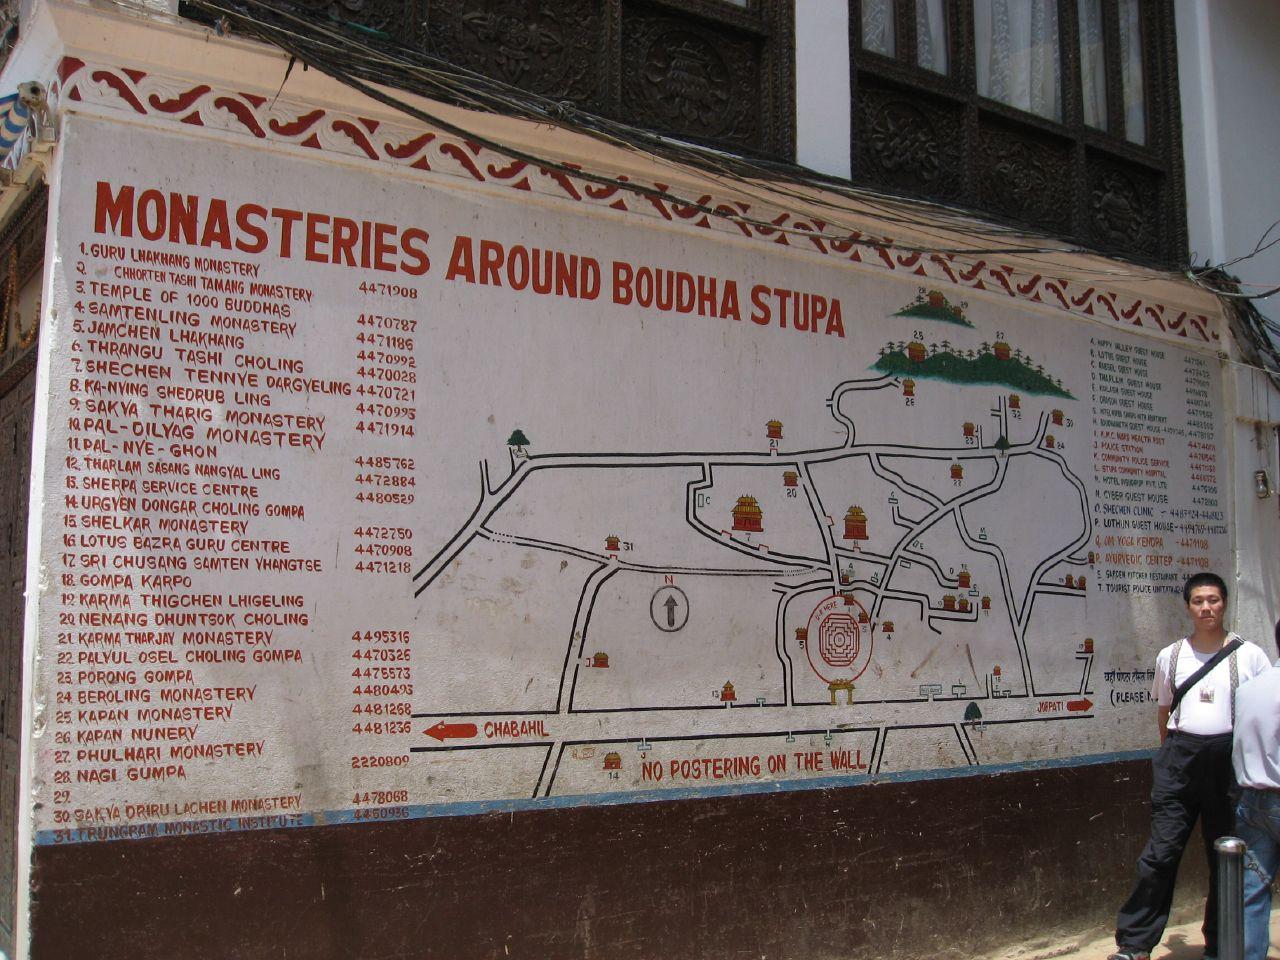 Map of monasteries